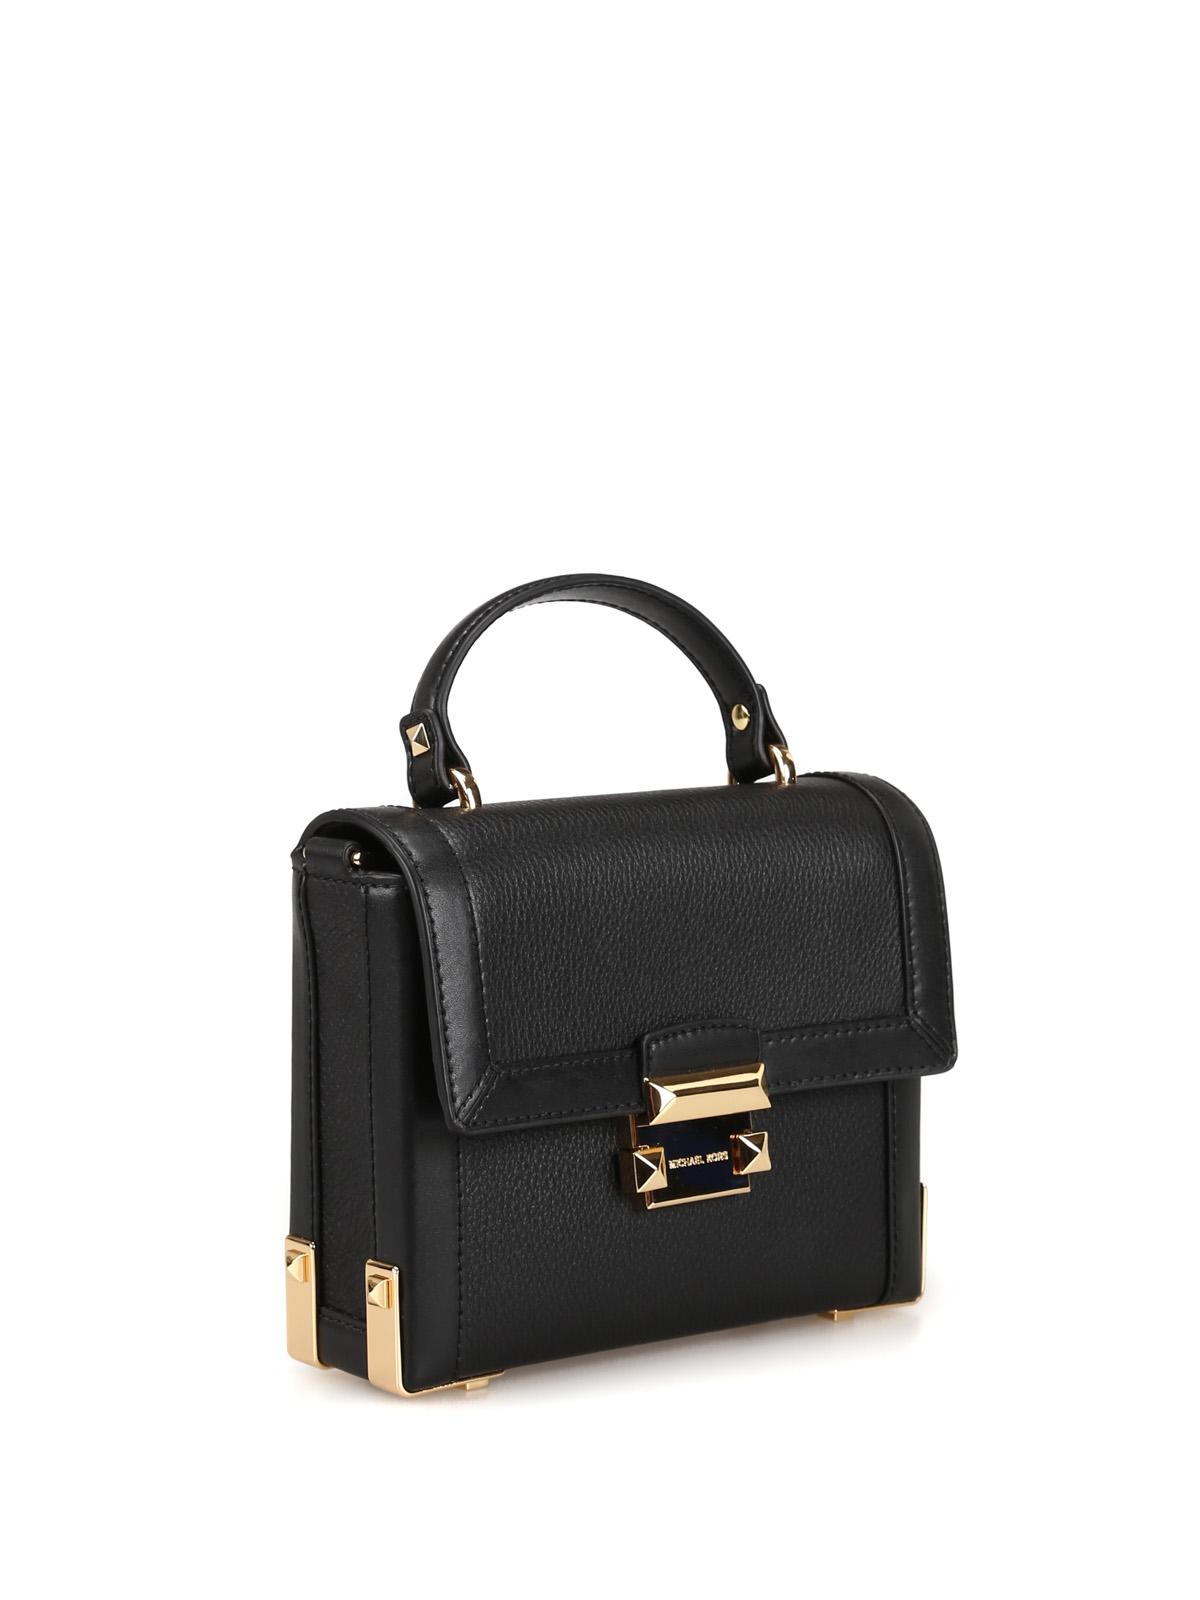 92edd88bf6f MICHAEL KORS: cross body bags online - Jayne black leather small trunk bag